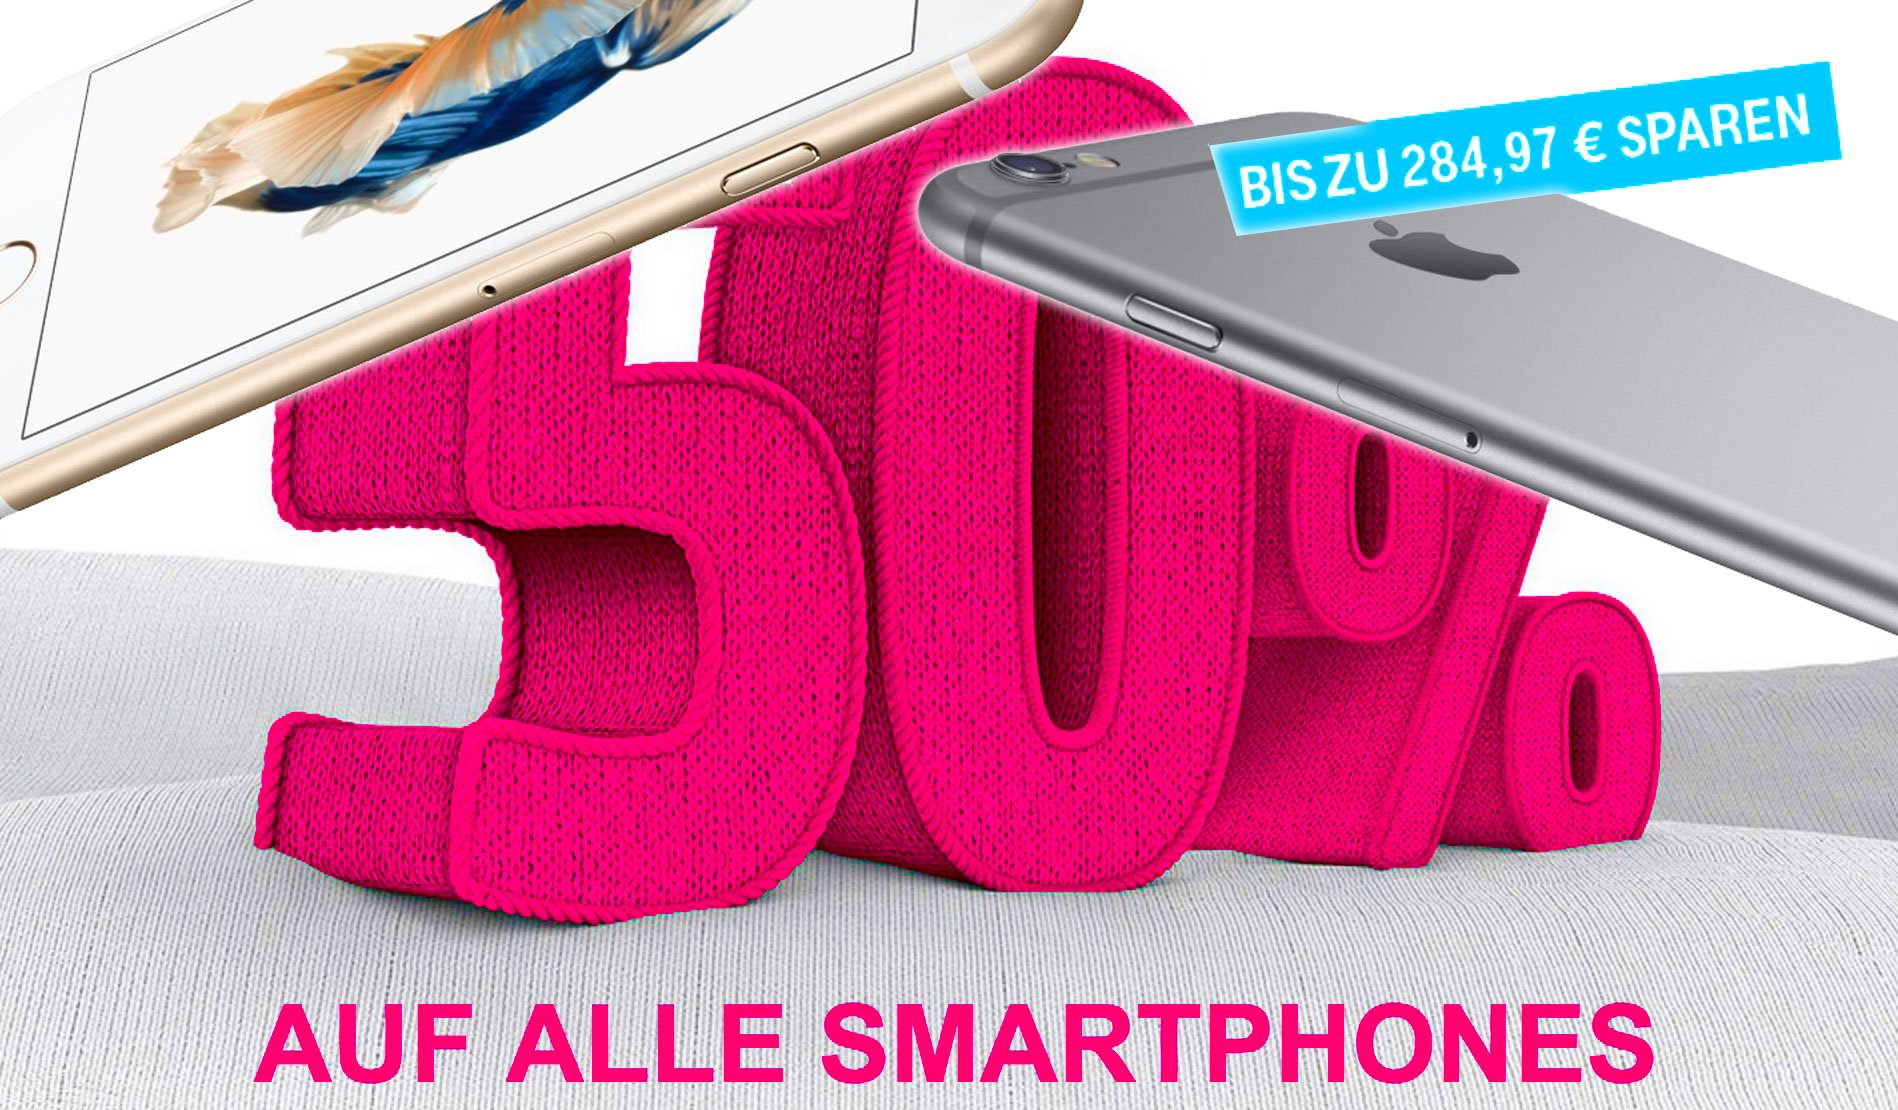 iPhone 6s Telekom Aktion: alle Smartphones (auch iPhone) 50% billiger 10